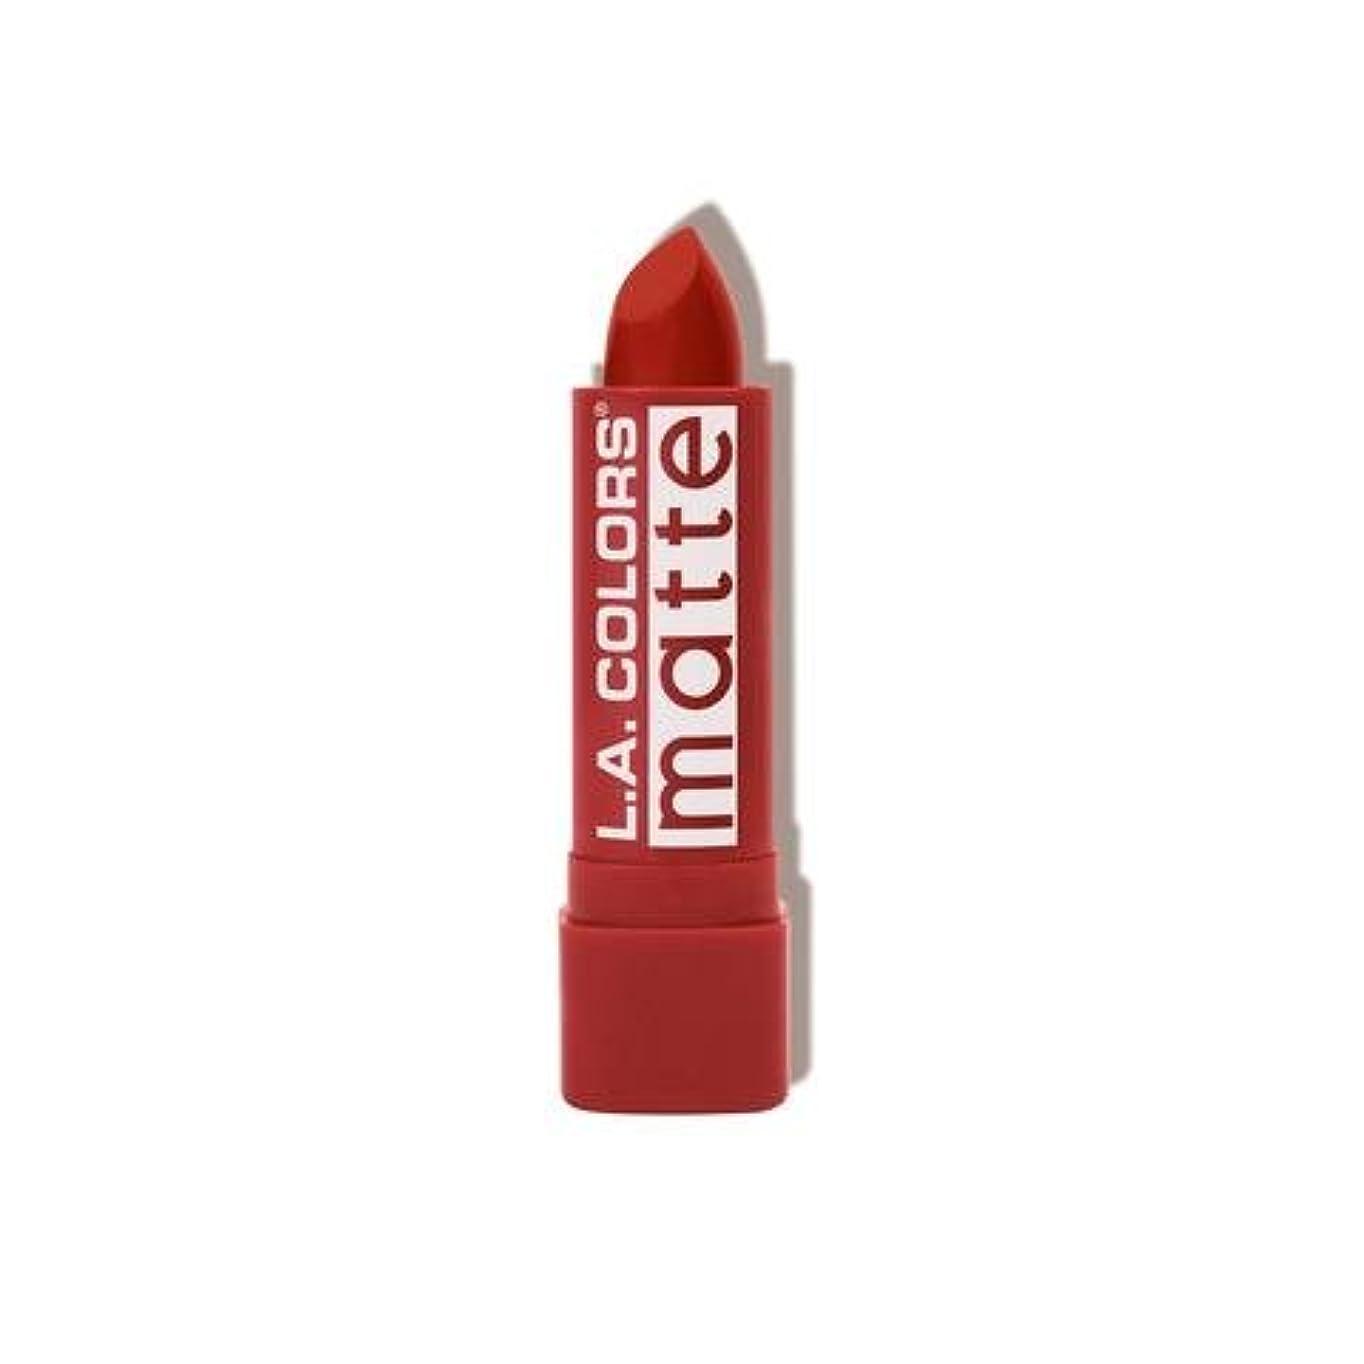 細胞同時無人L.A. COLORS Matte Lip Color - Red Tango (並行輸入品)